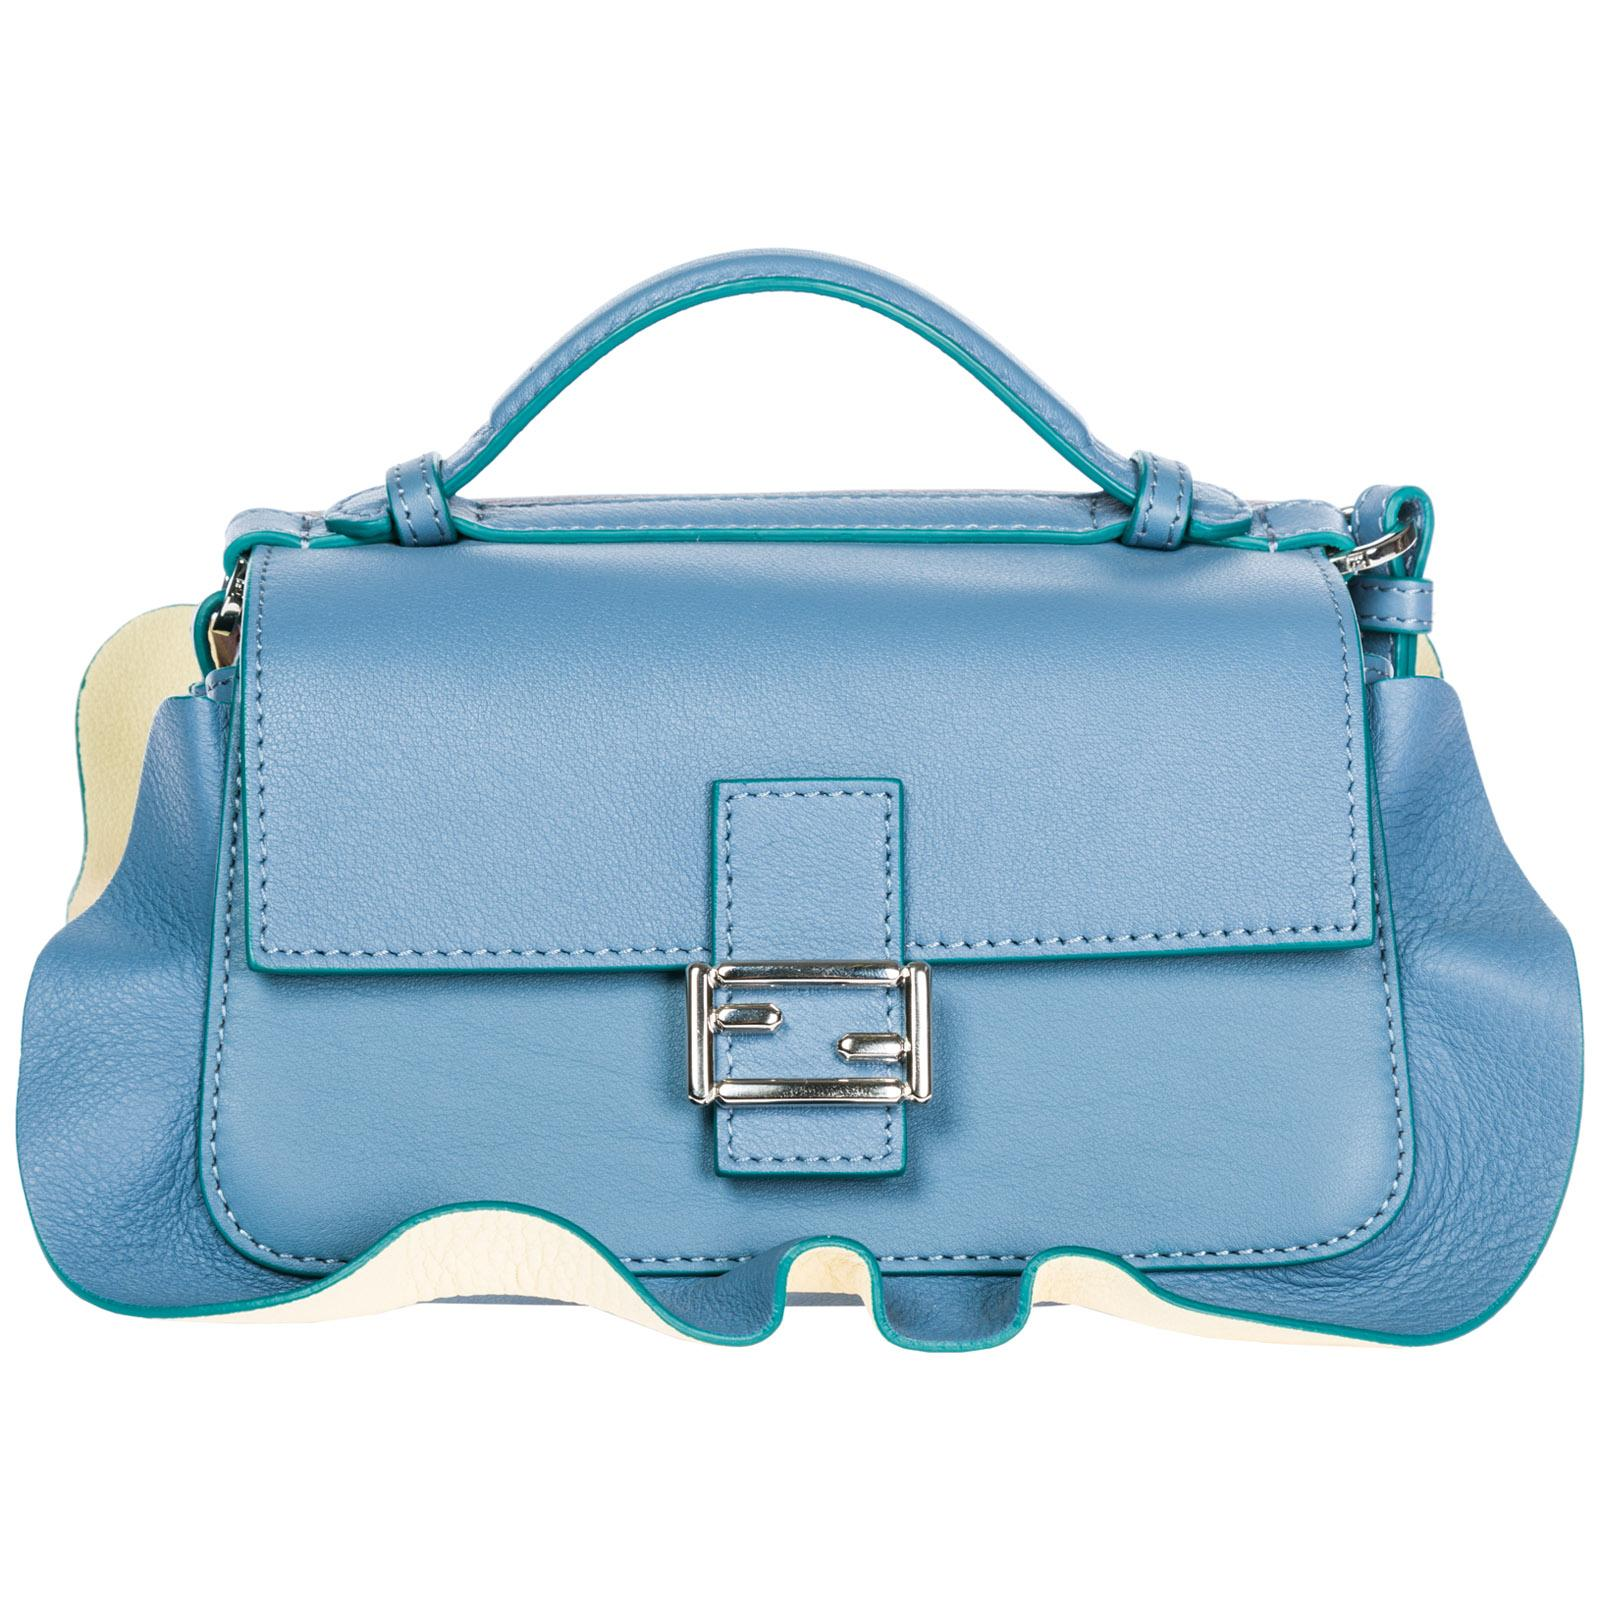 6906e2fdca2b Fendi Women S Leather Shoulder Bag Doppia Micro Baguette In Blue ...